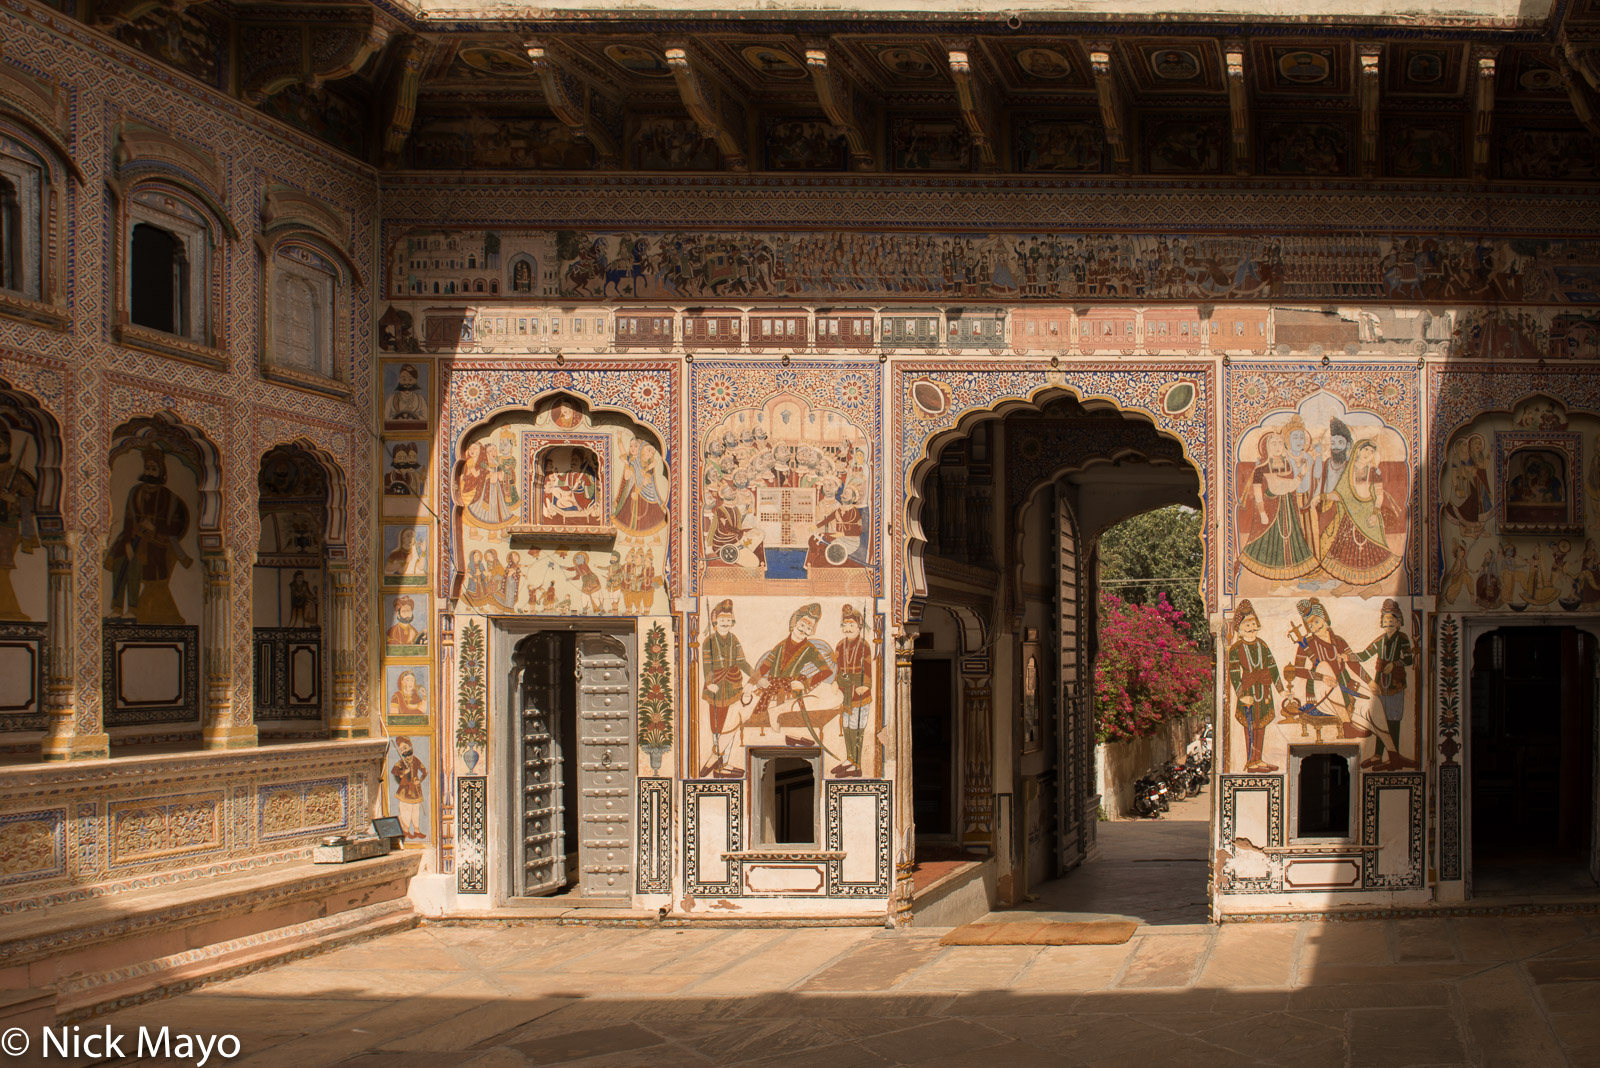 Courtyard, Gate, India, Mural, Rajasthan, photo